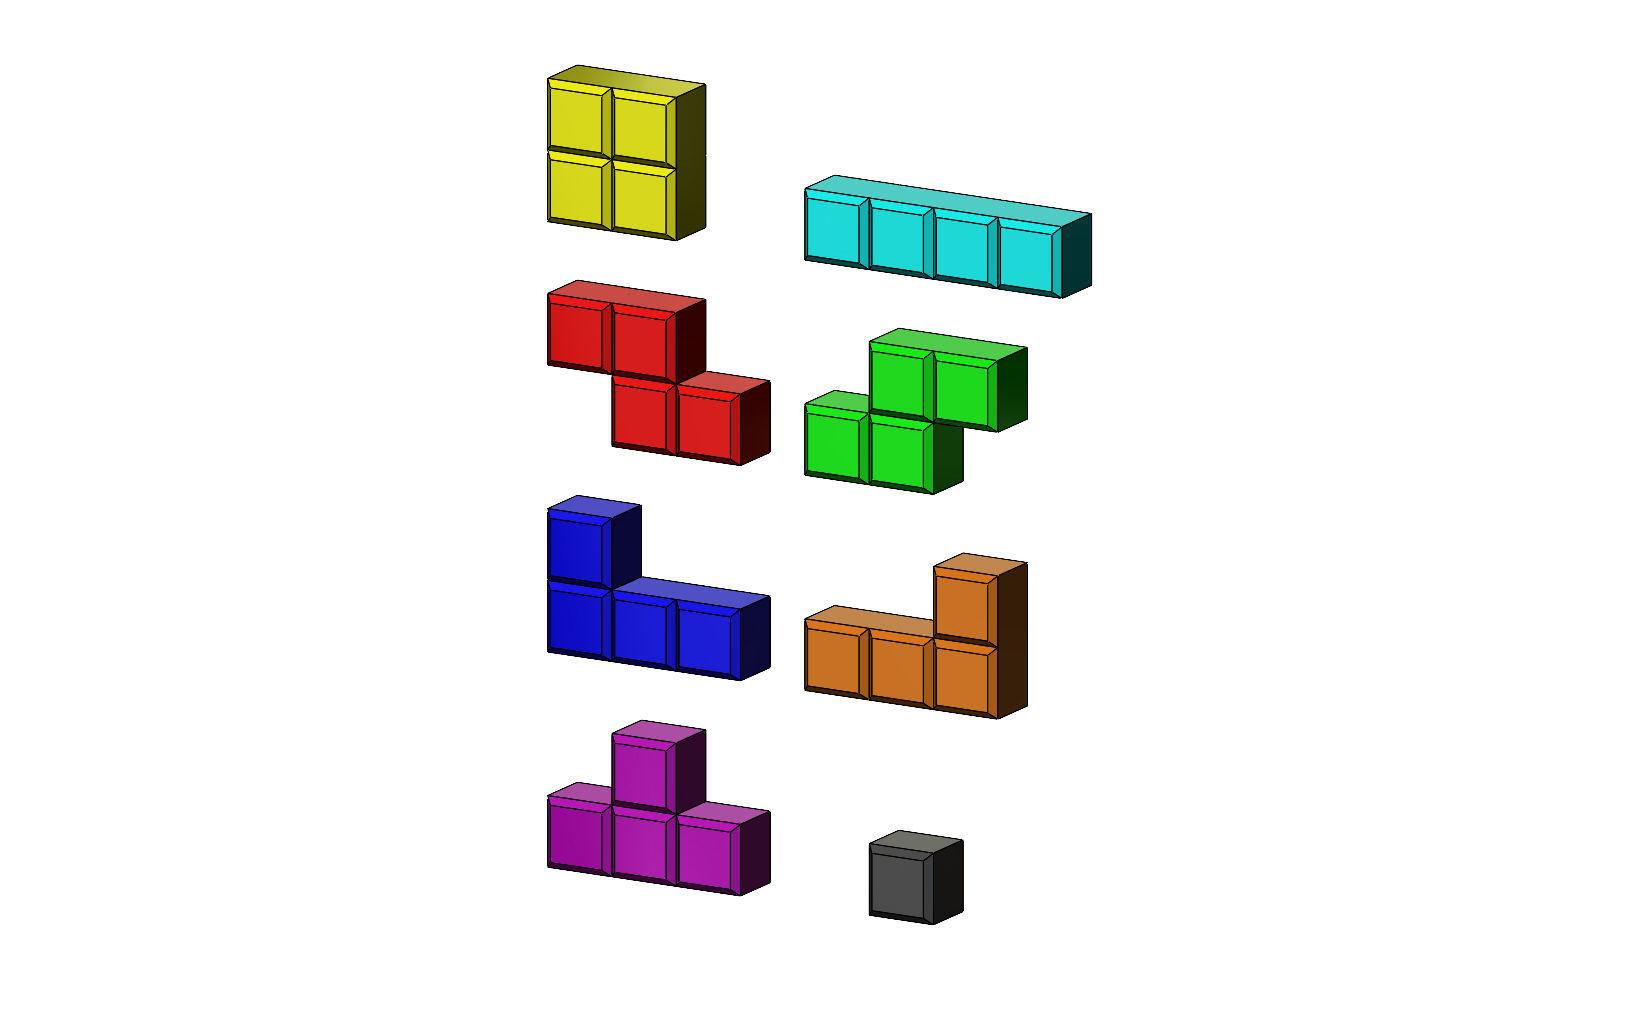 Tetrise blocks